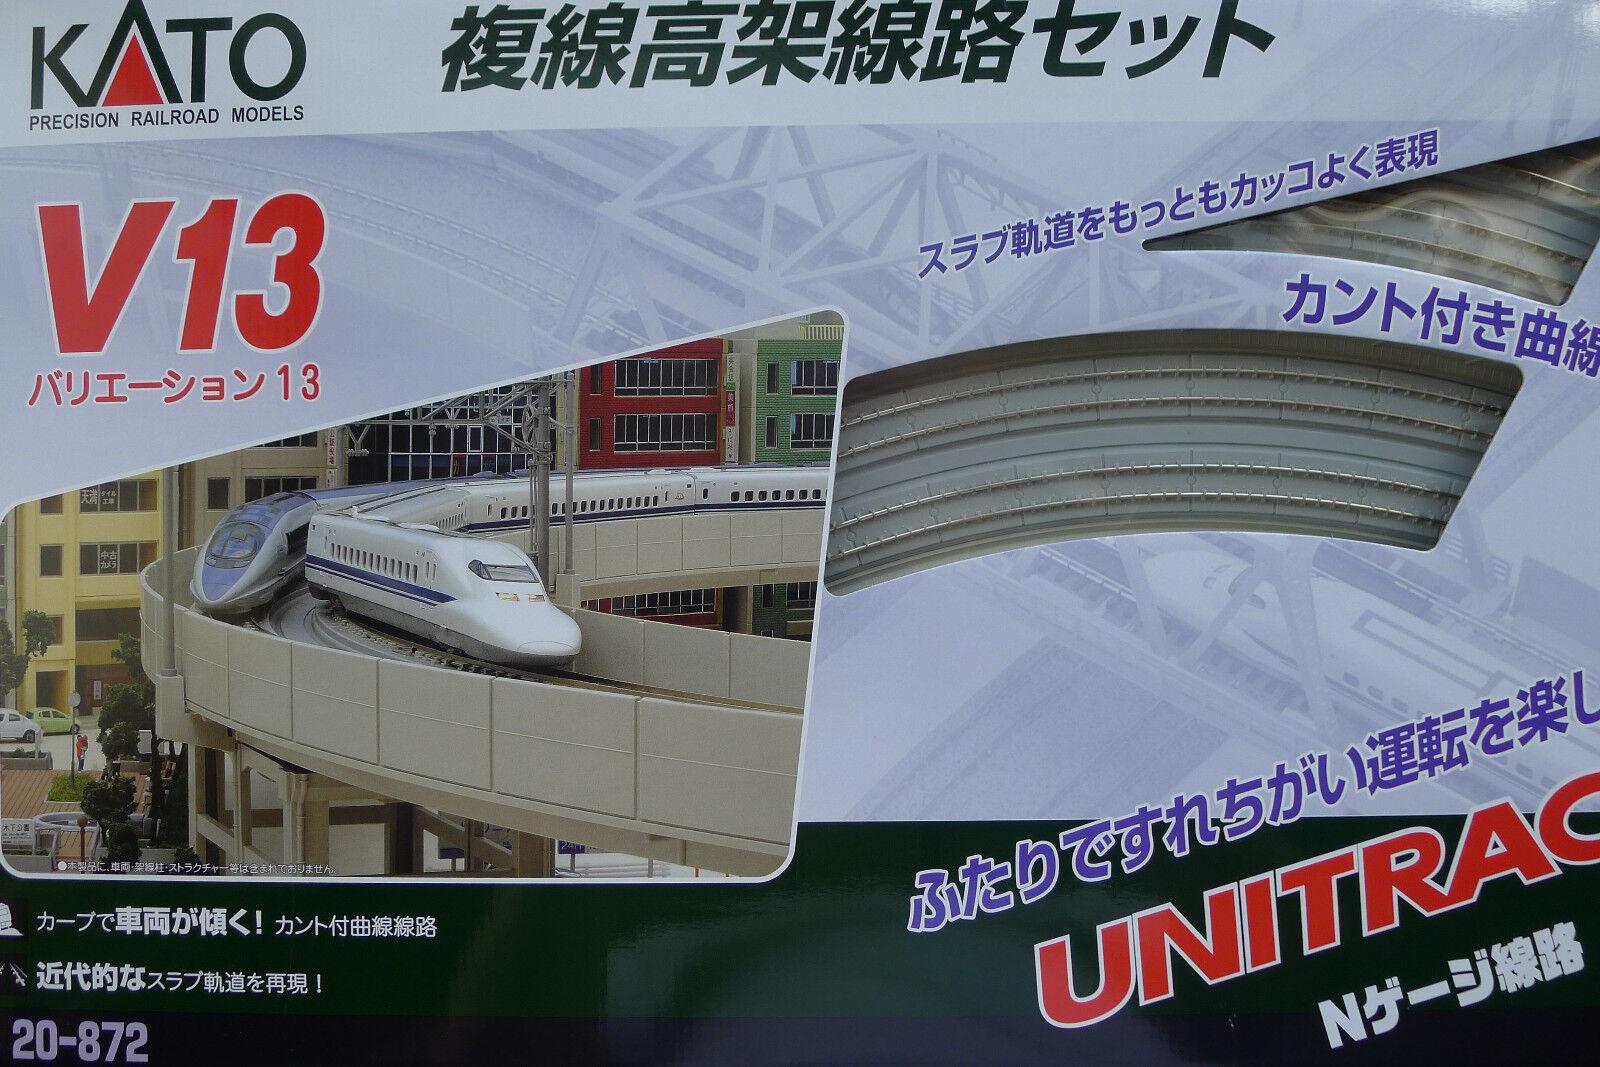 Kato N Scale 20-872 Unitrack variación Set V13